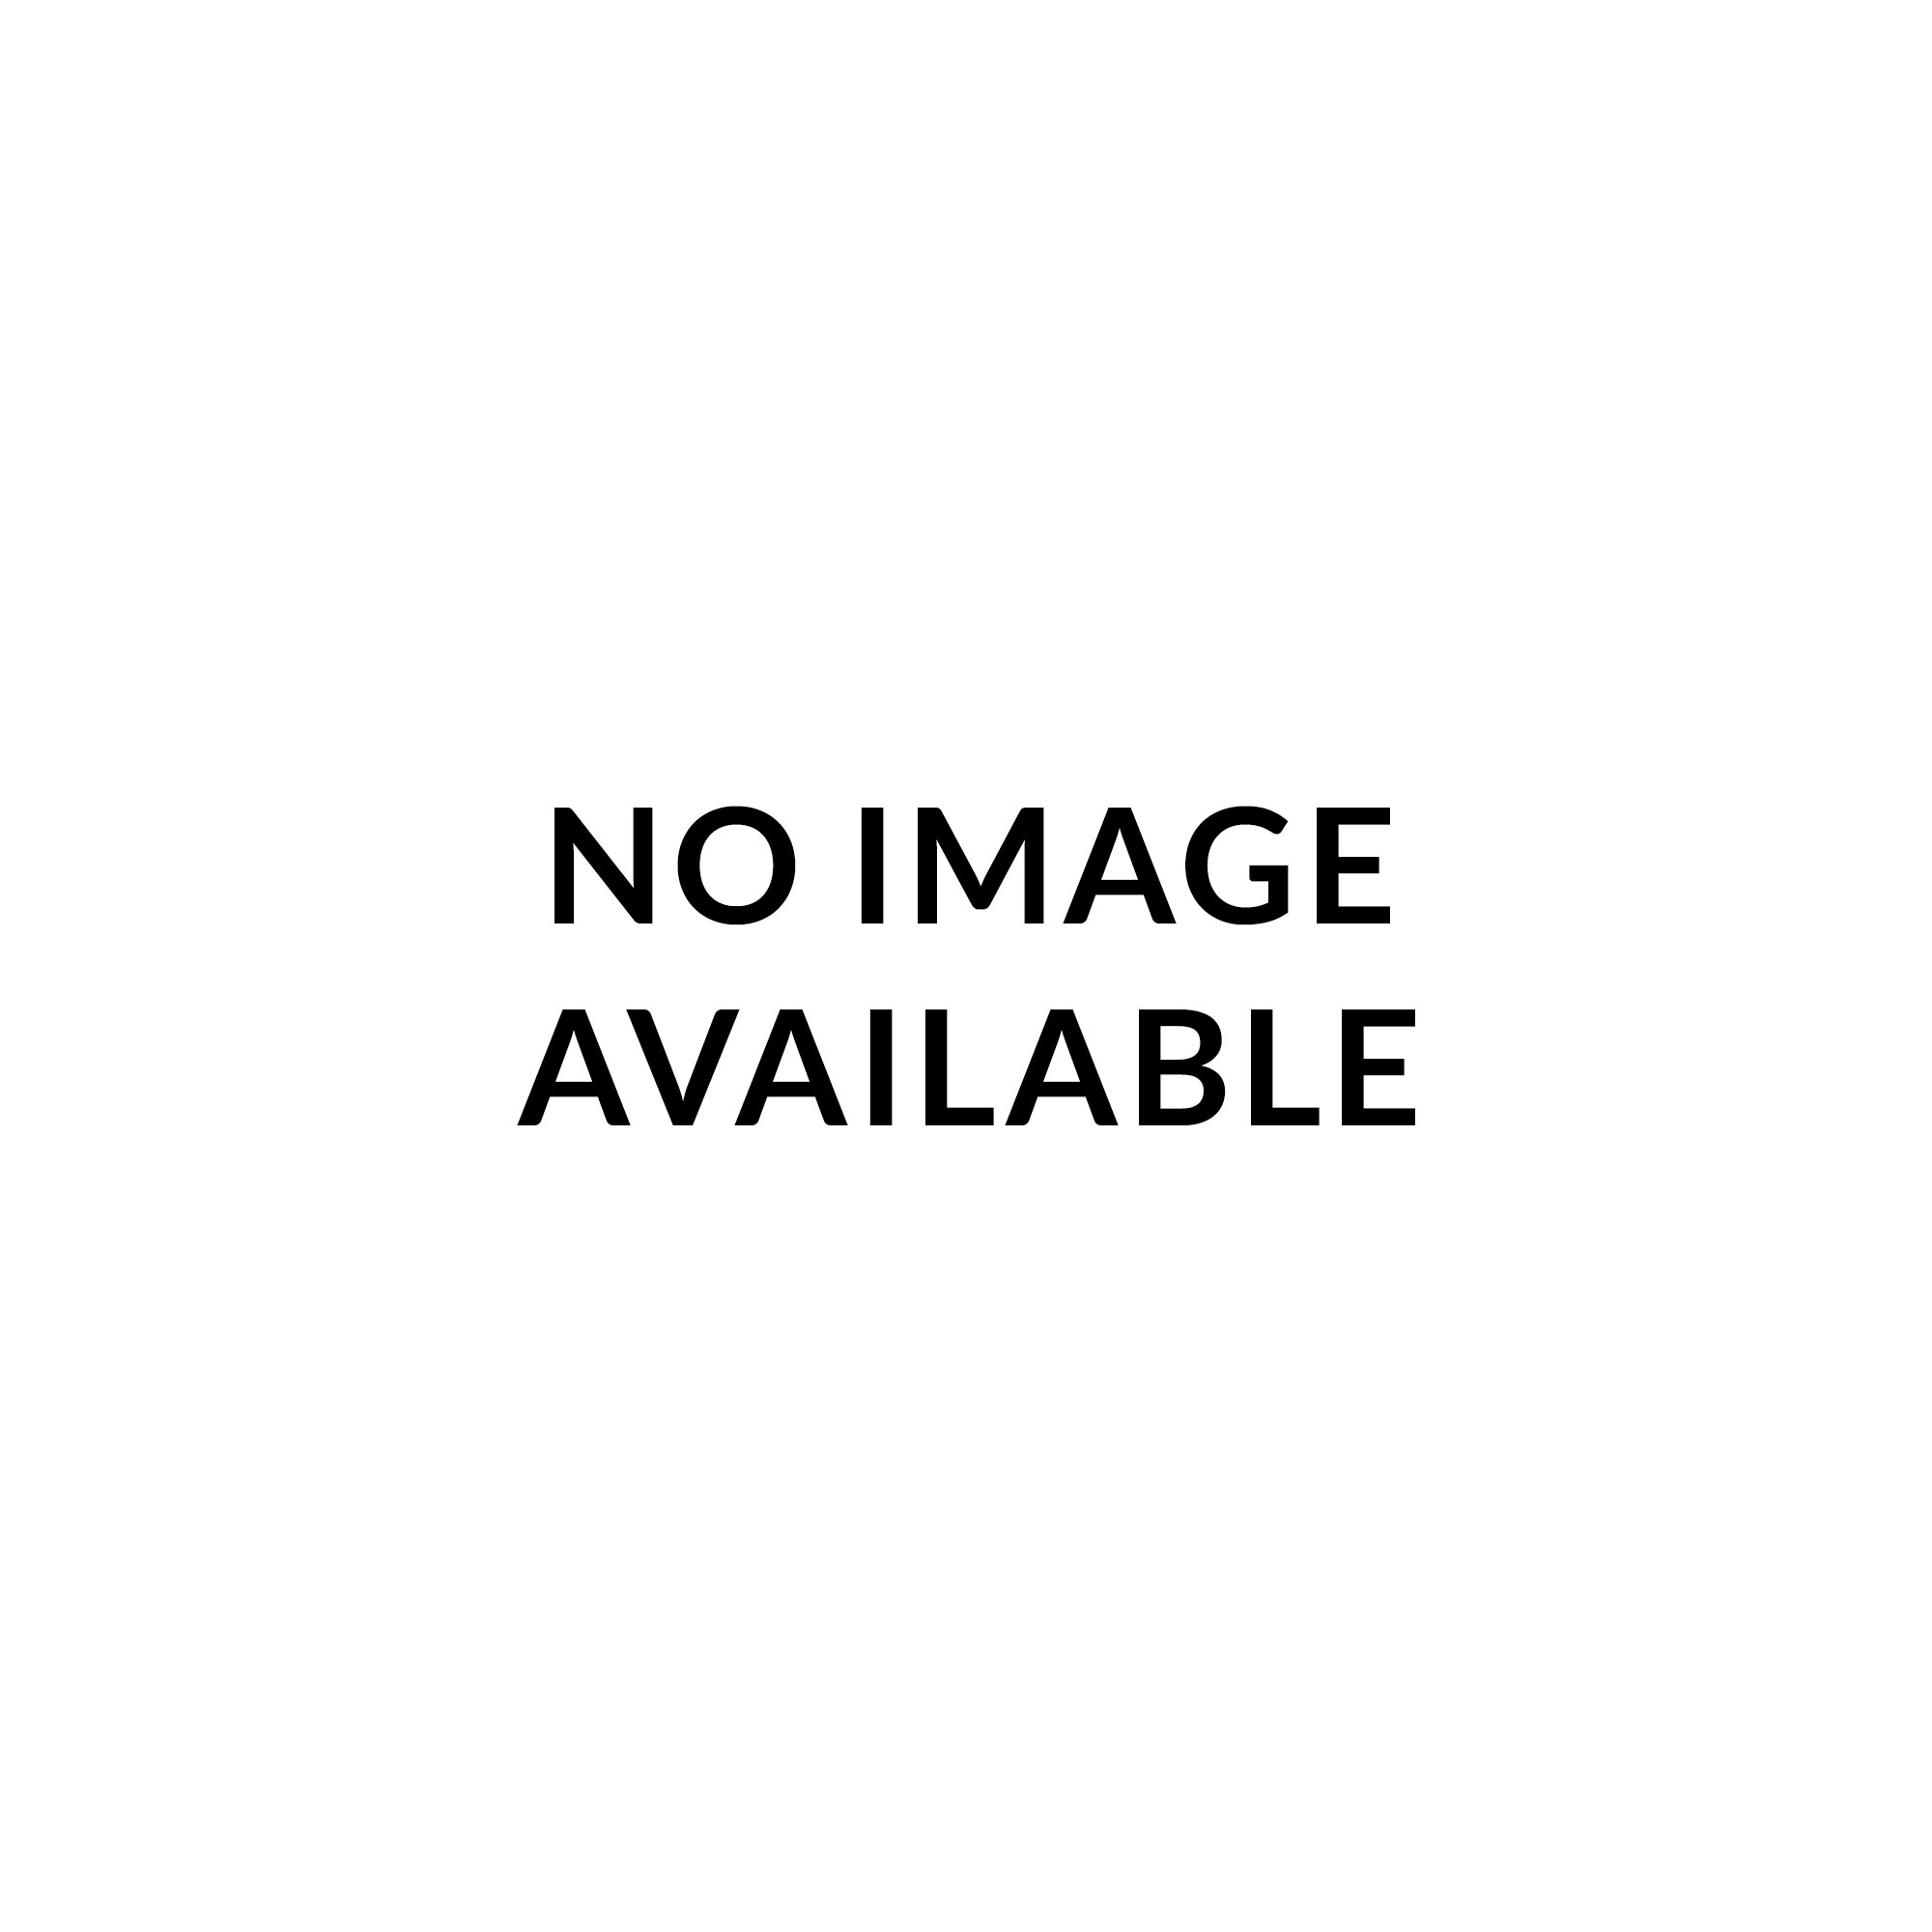 D'Addario XB130SL Nickel Wound XL Bass Single String .130 Super Long Scale